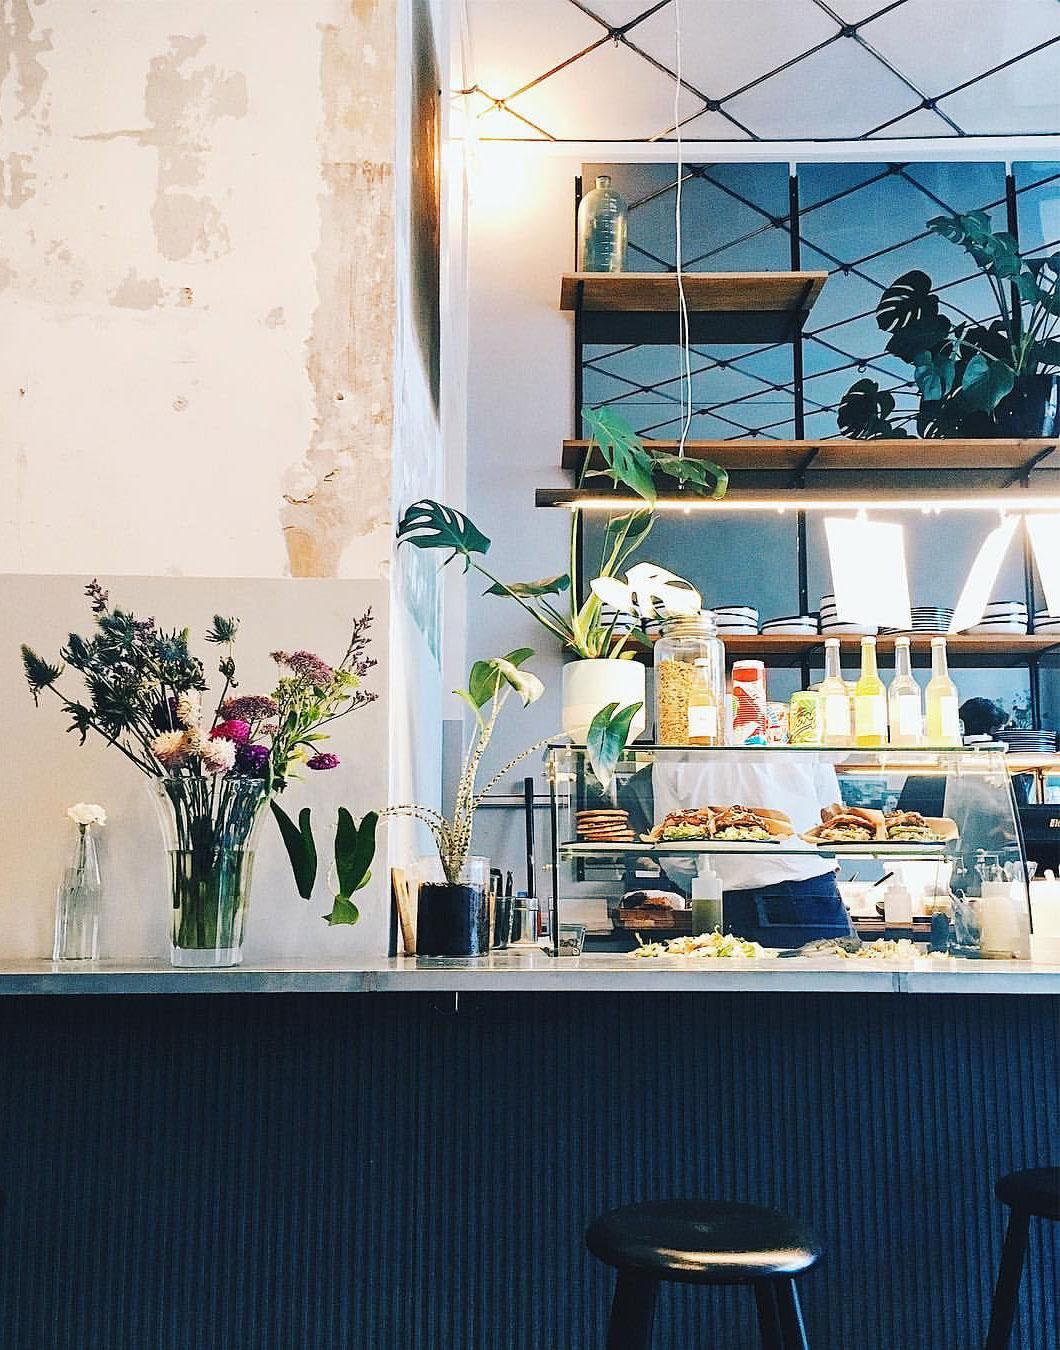 Artsy_Cafes_in_Copenhagen_Sonny.jpg